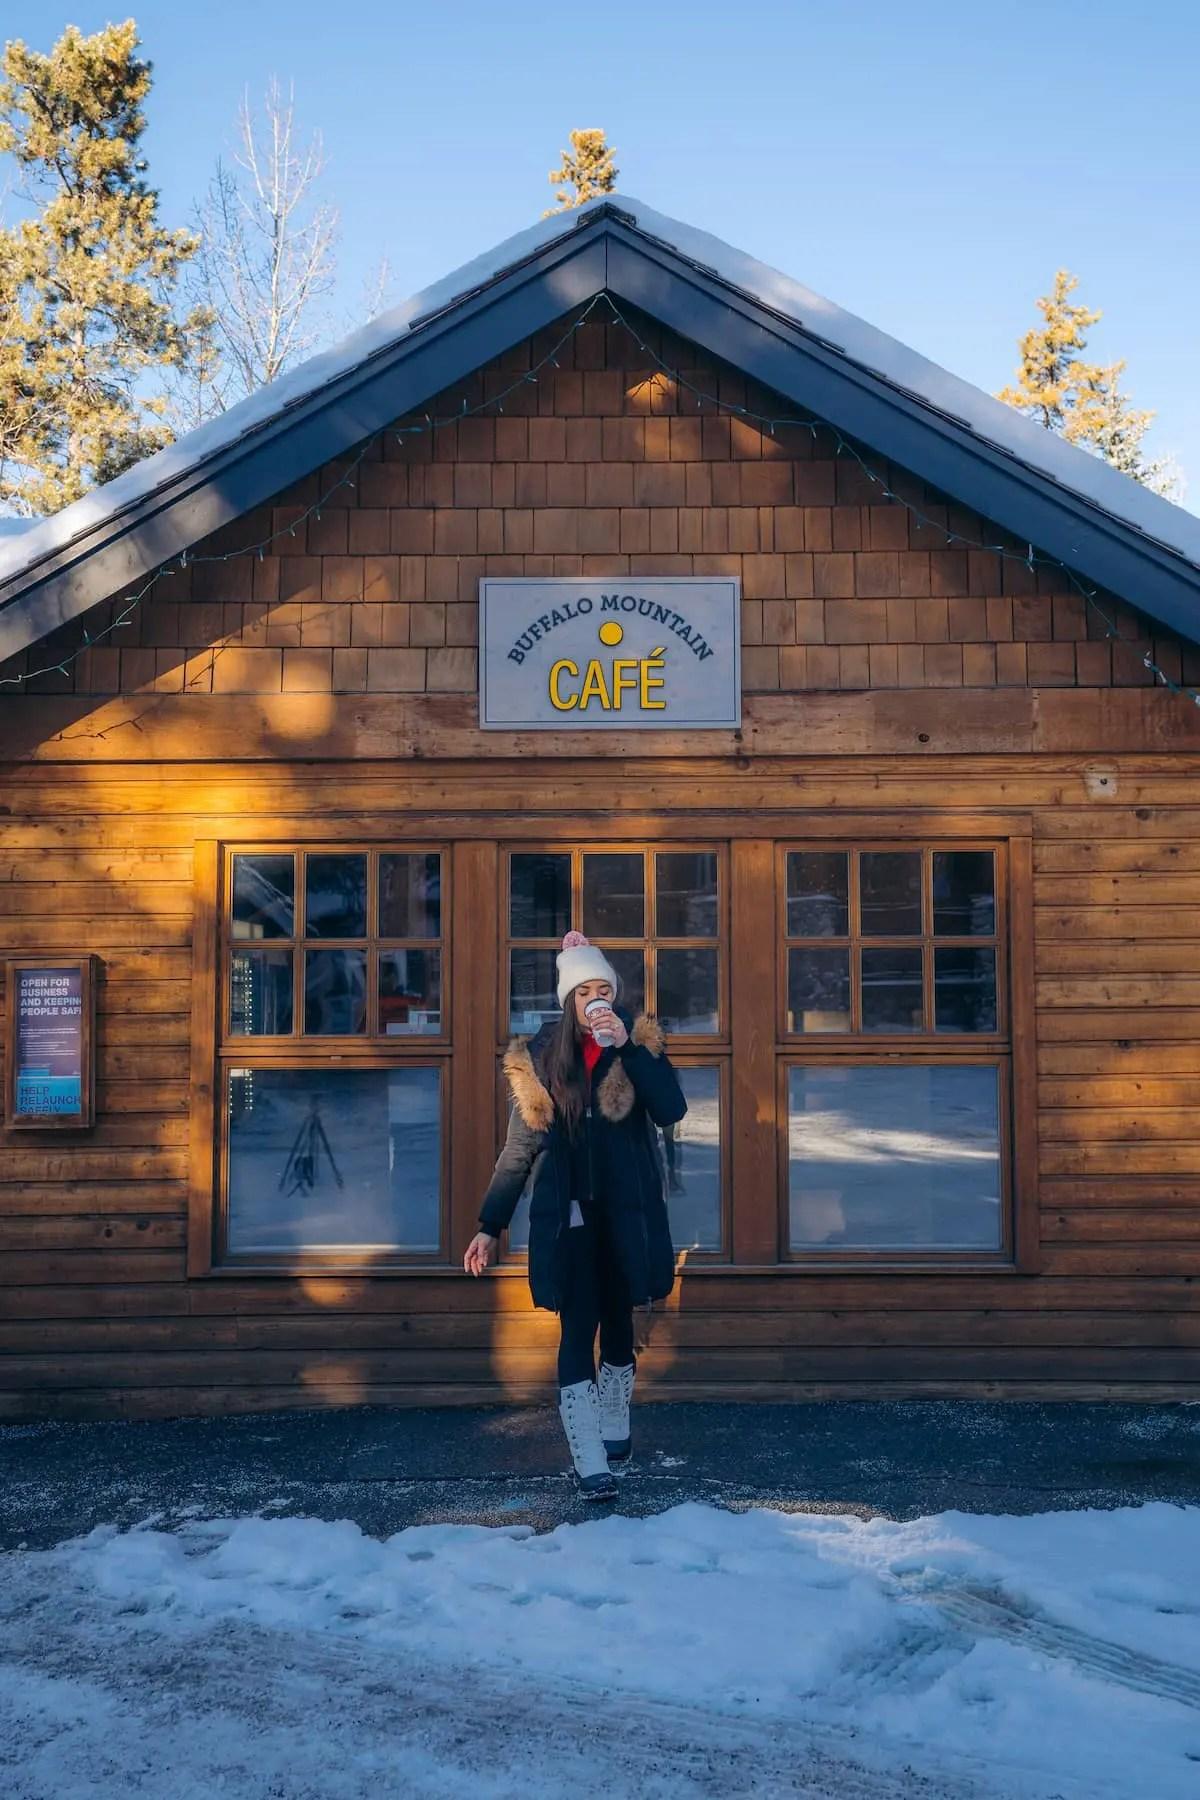 Buffalo Mountain Cafe at Buffalo Mountain Lodge